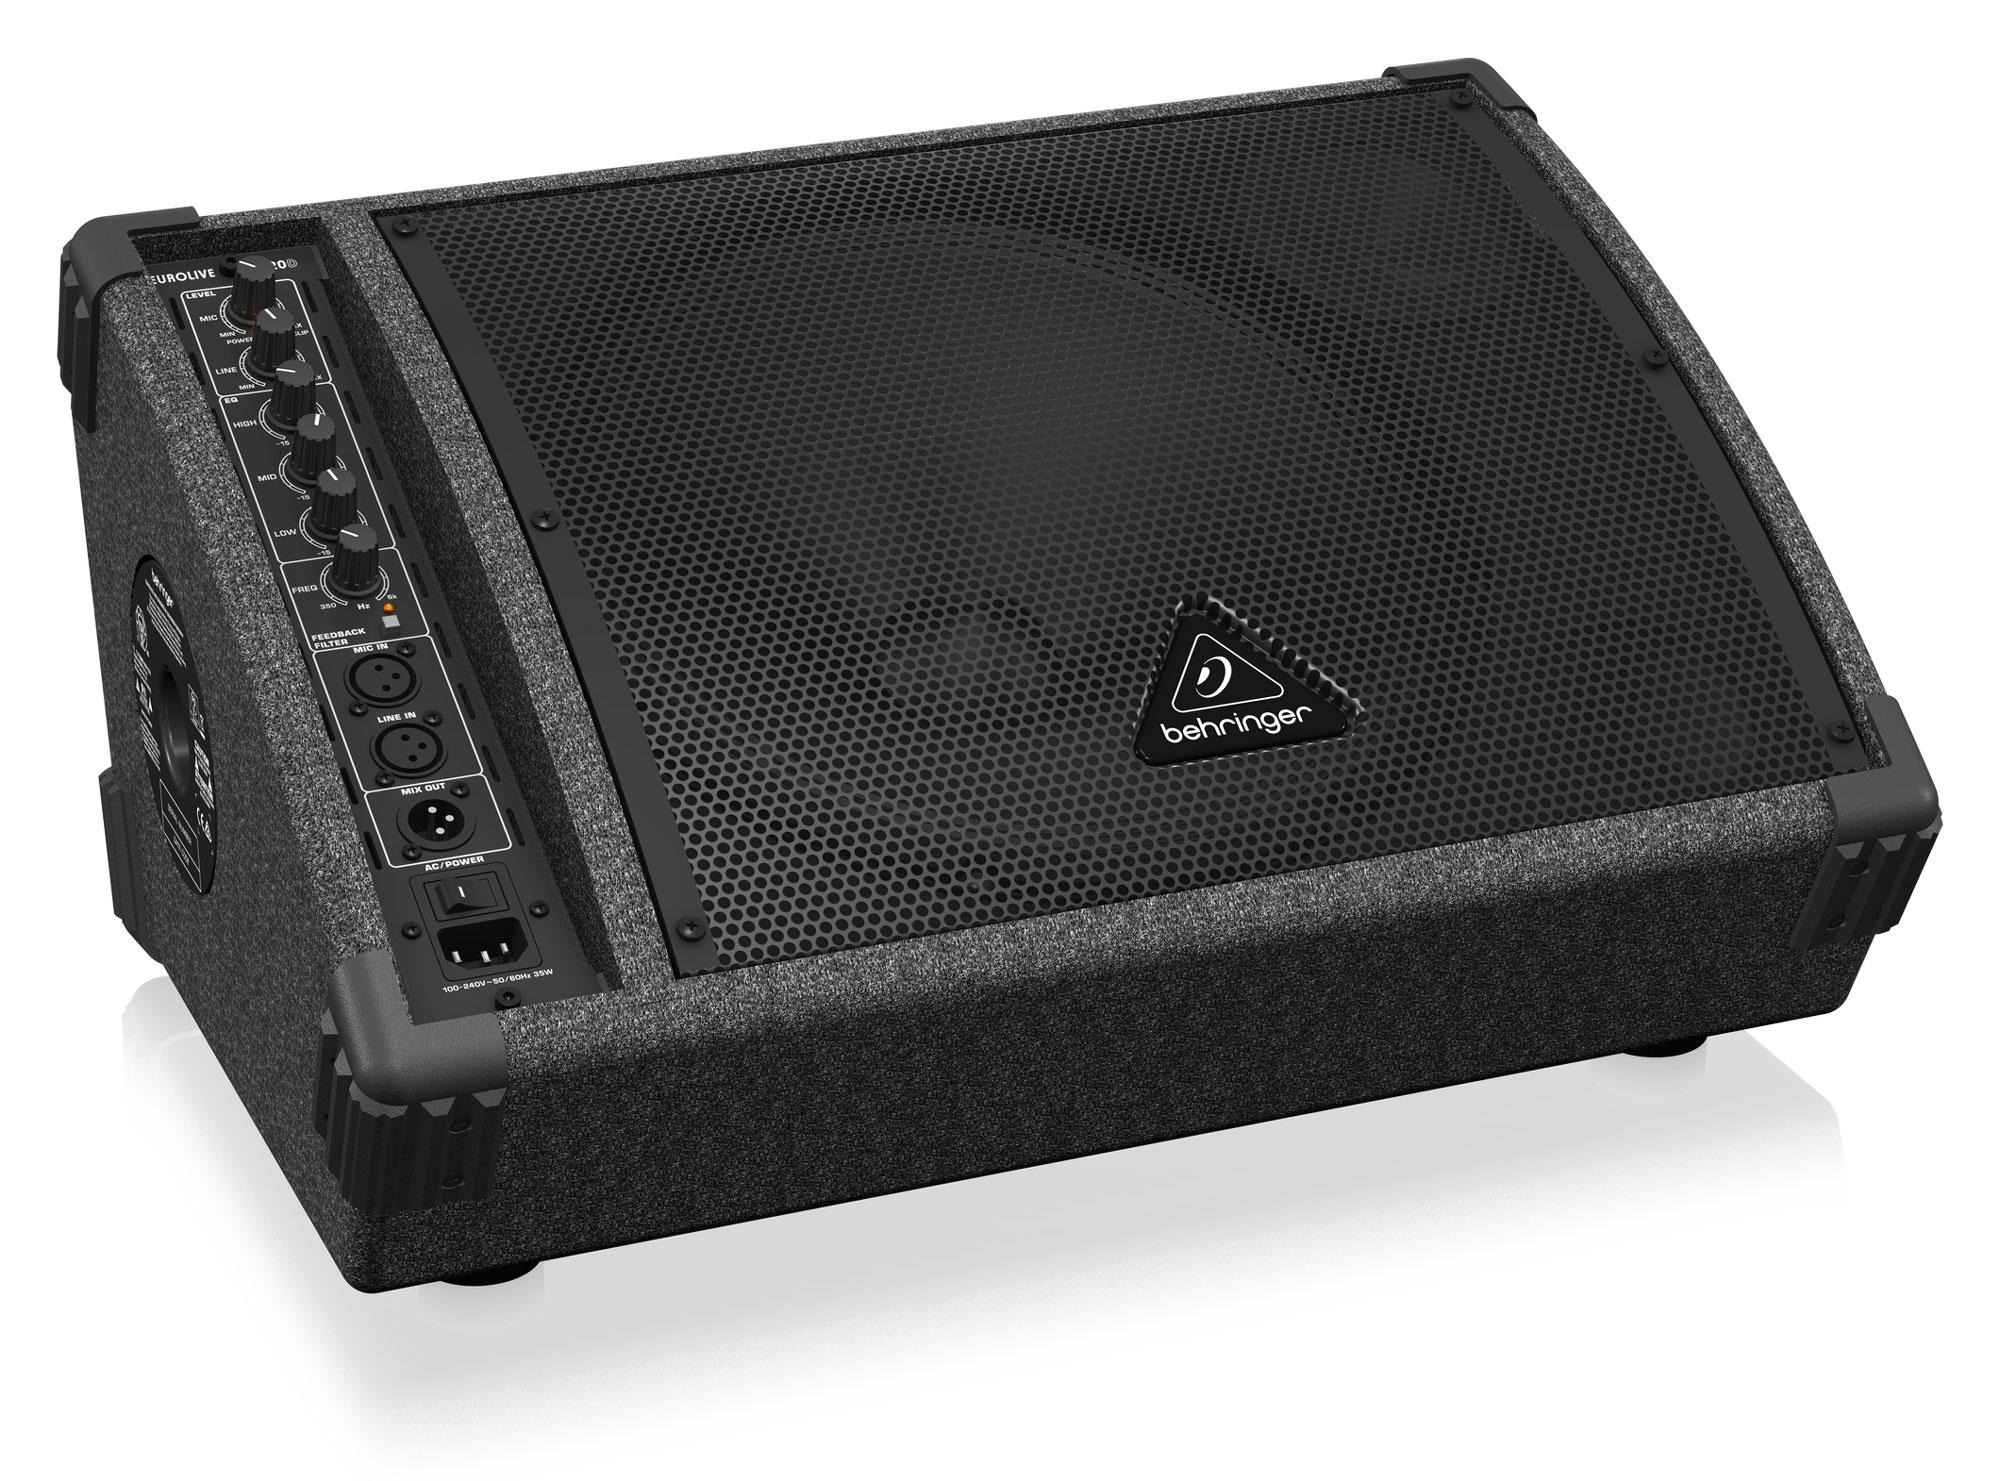 Paendstufen - Behringer F1220D Eurolive Box Lautsprecher Retoure (Zustand sehr gut) - Onlineshop Musikhaus Kirstein